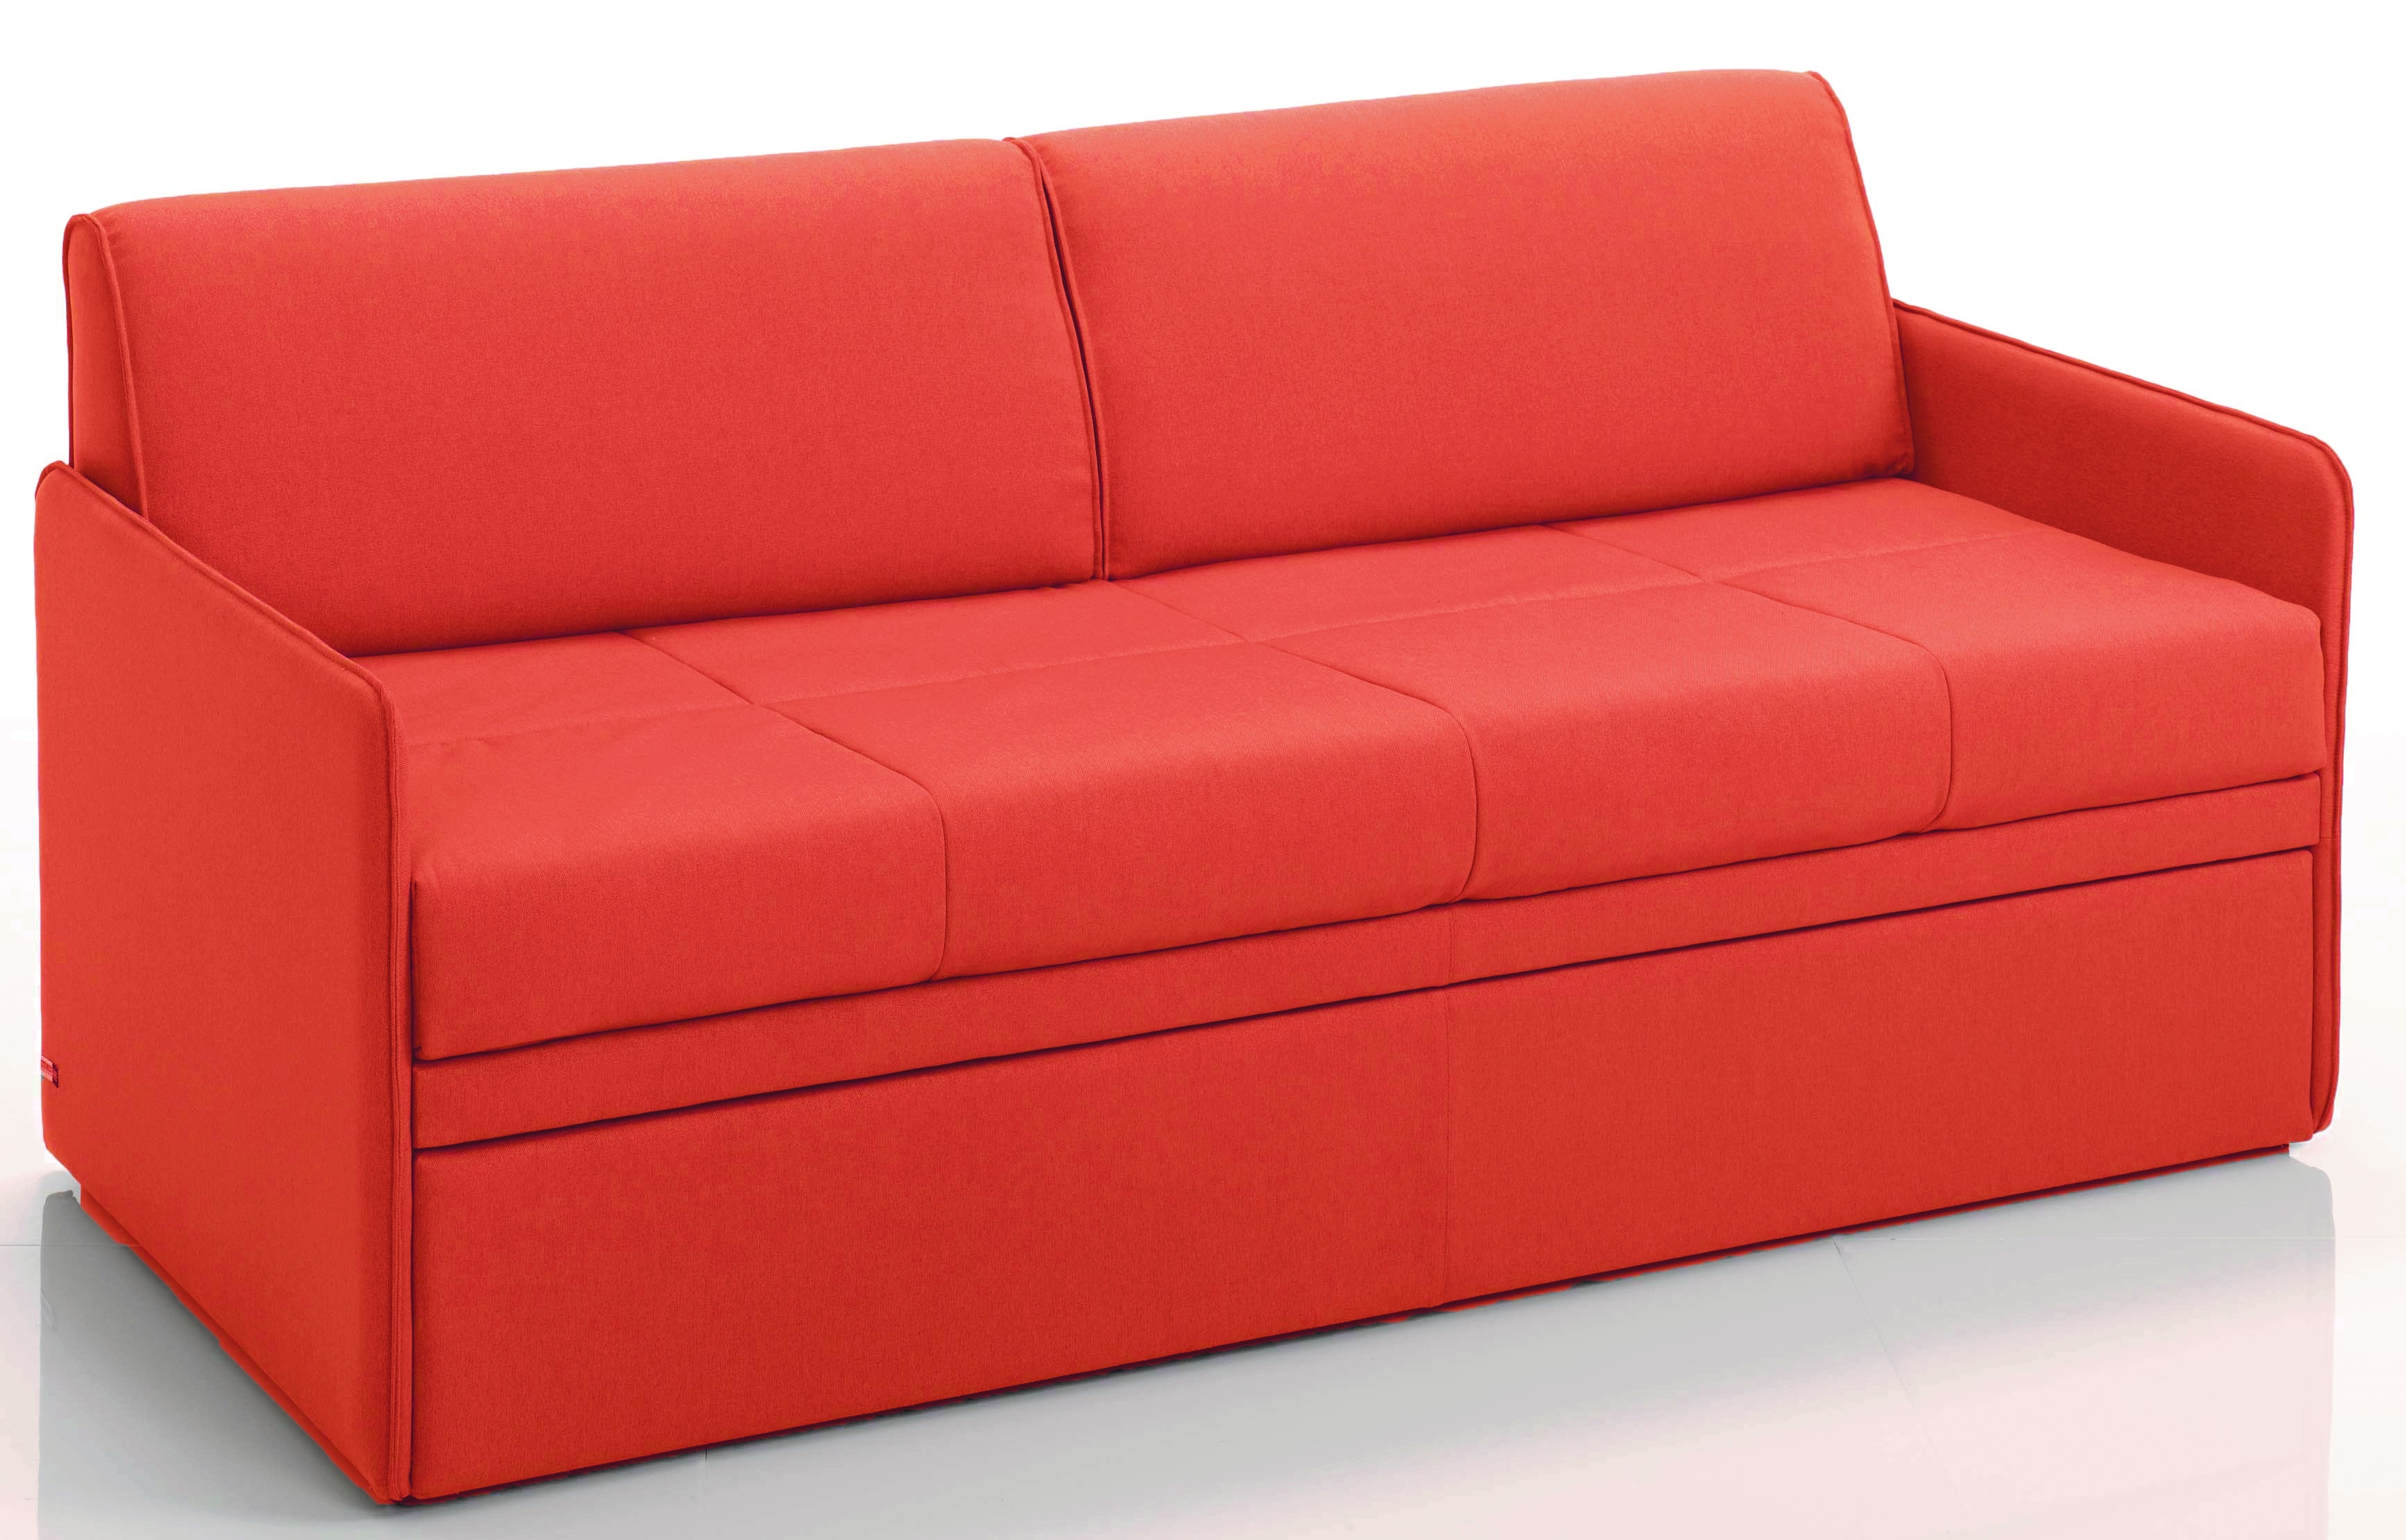 canap convertible gigogne 3 places microfibre orange cassis. Black Bedroom Furniture Sets. Home Design Ideas